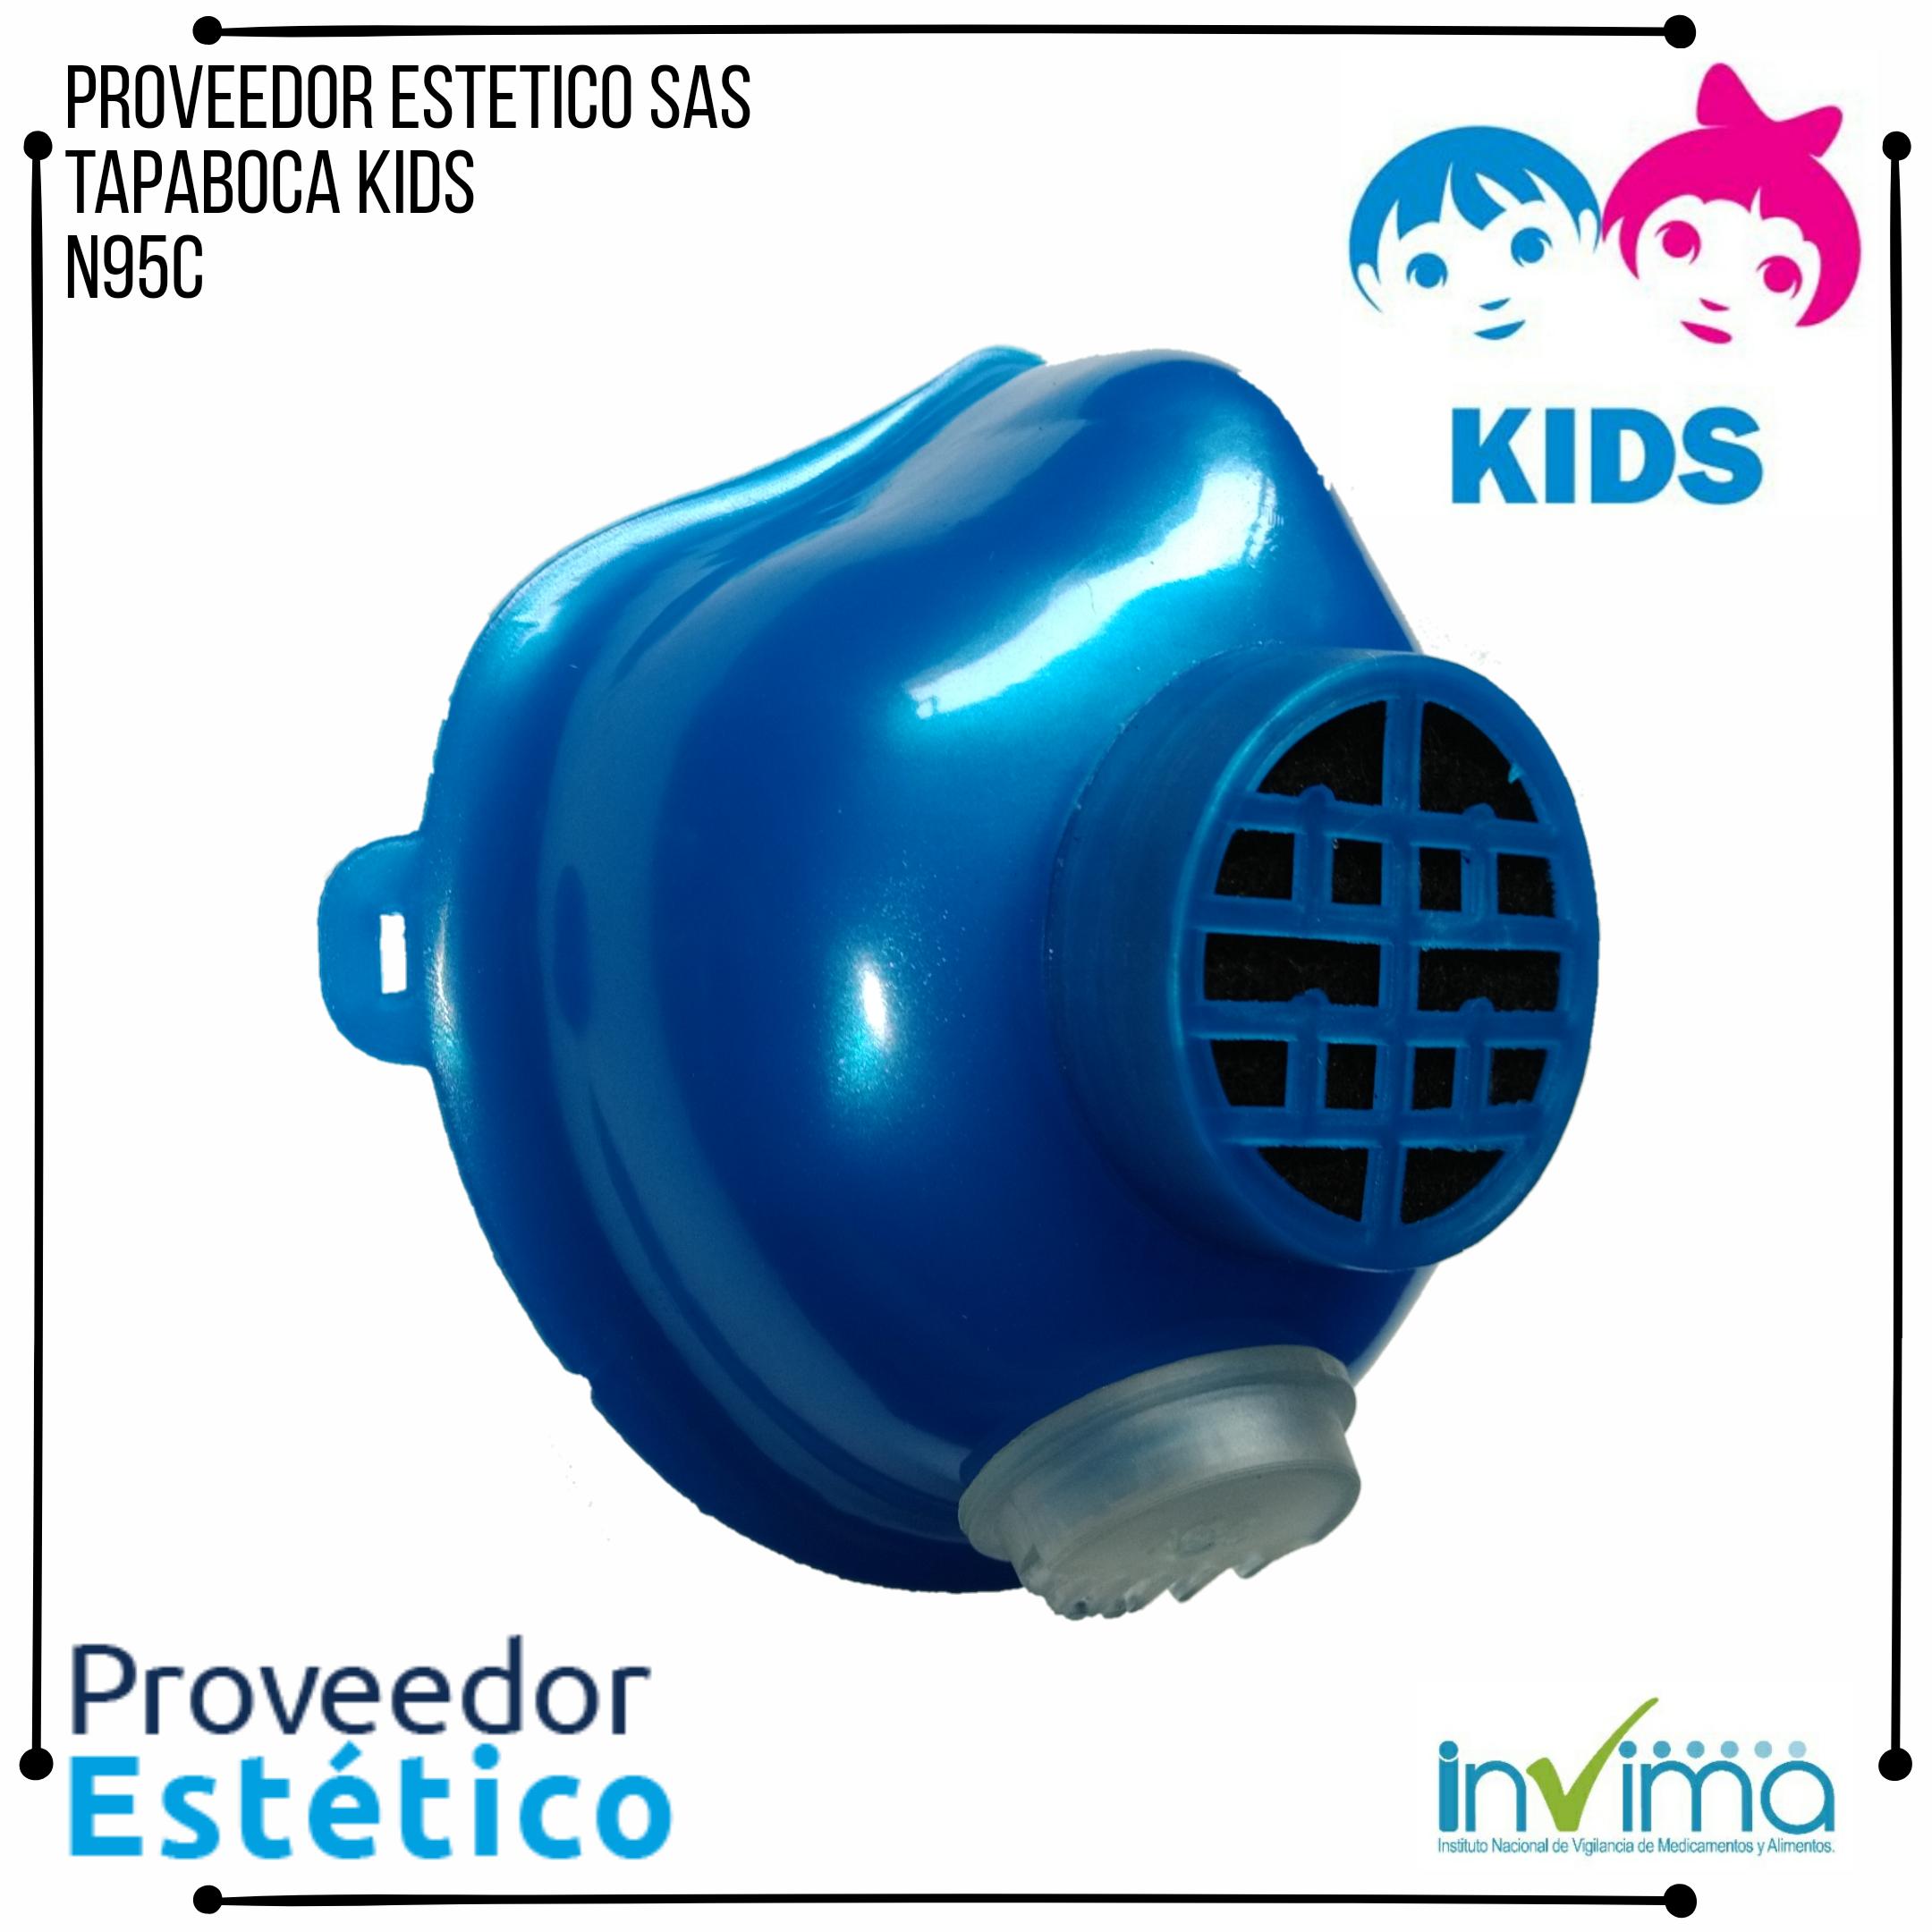 https://0201.nccdn.net/1_2/000/000/17f/e4c/Tapaboca-N95-Kids_5.png